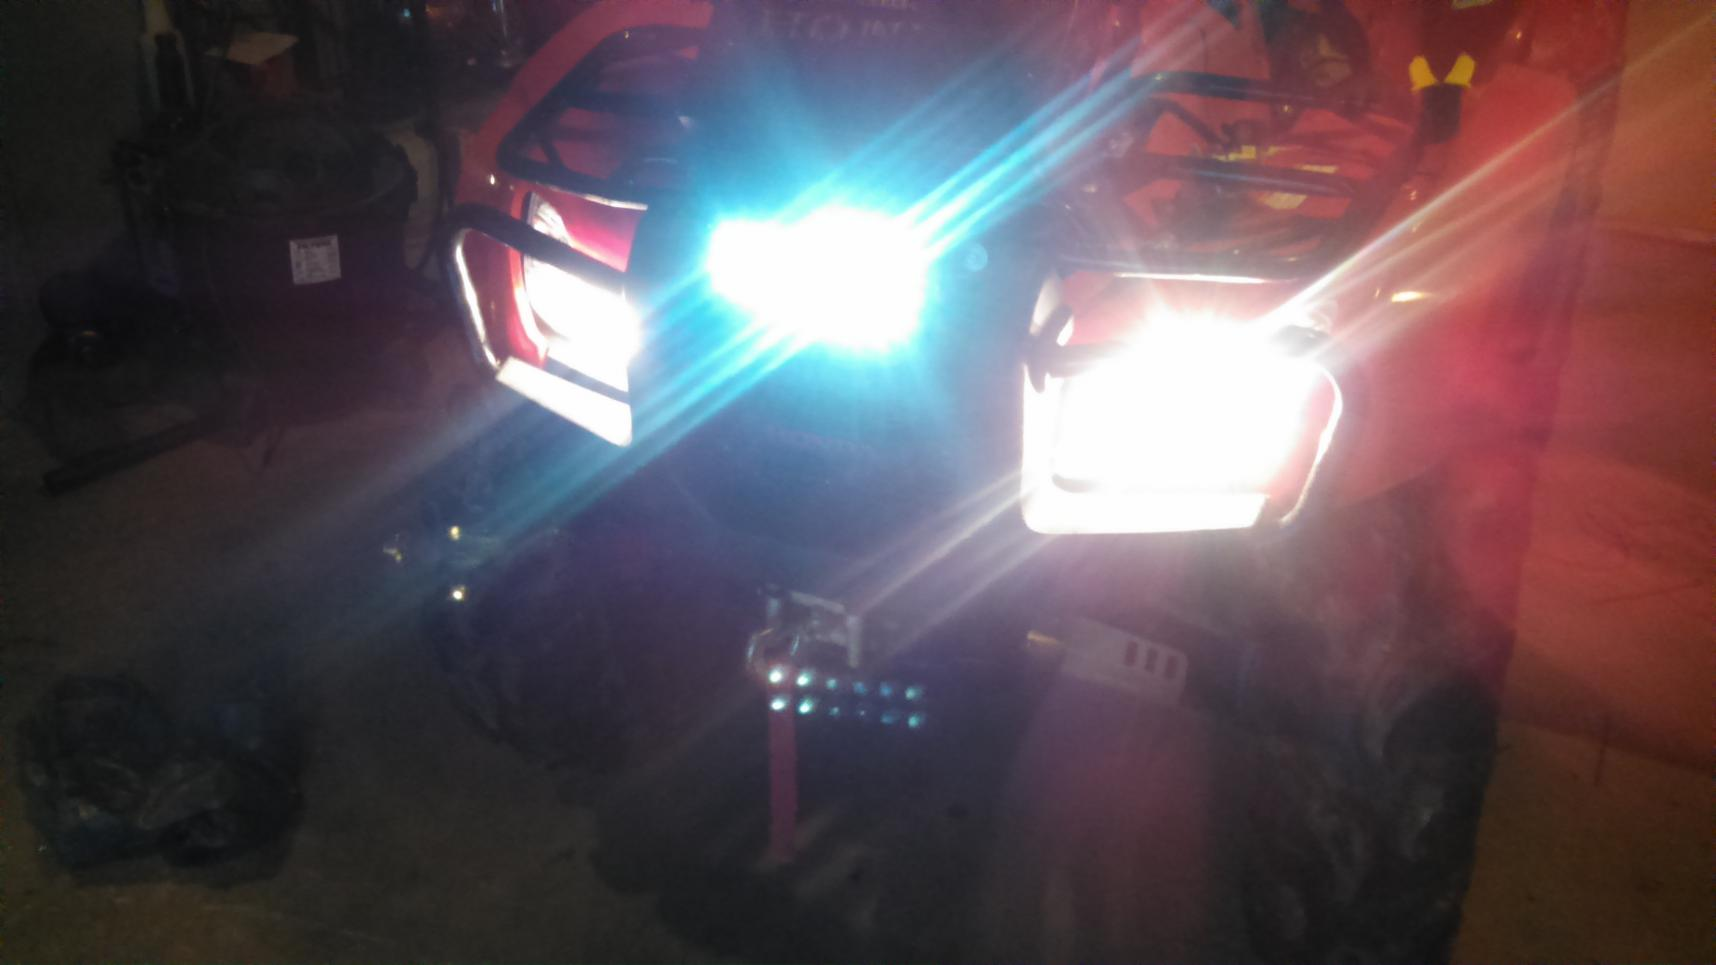 led light bar help - Page 2 - Honda Foreman Forums : Rubicon, Rincon ...